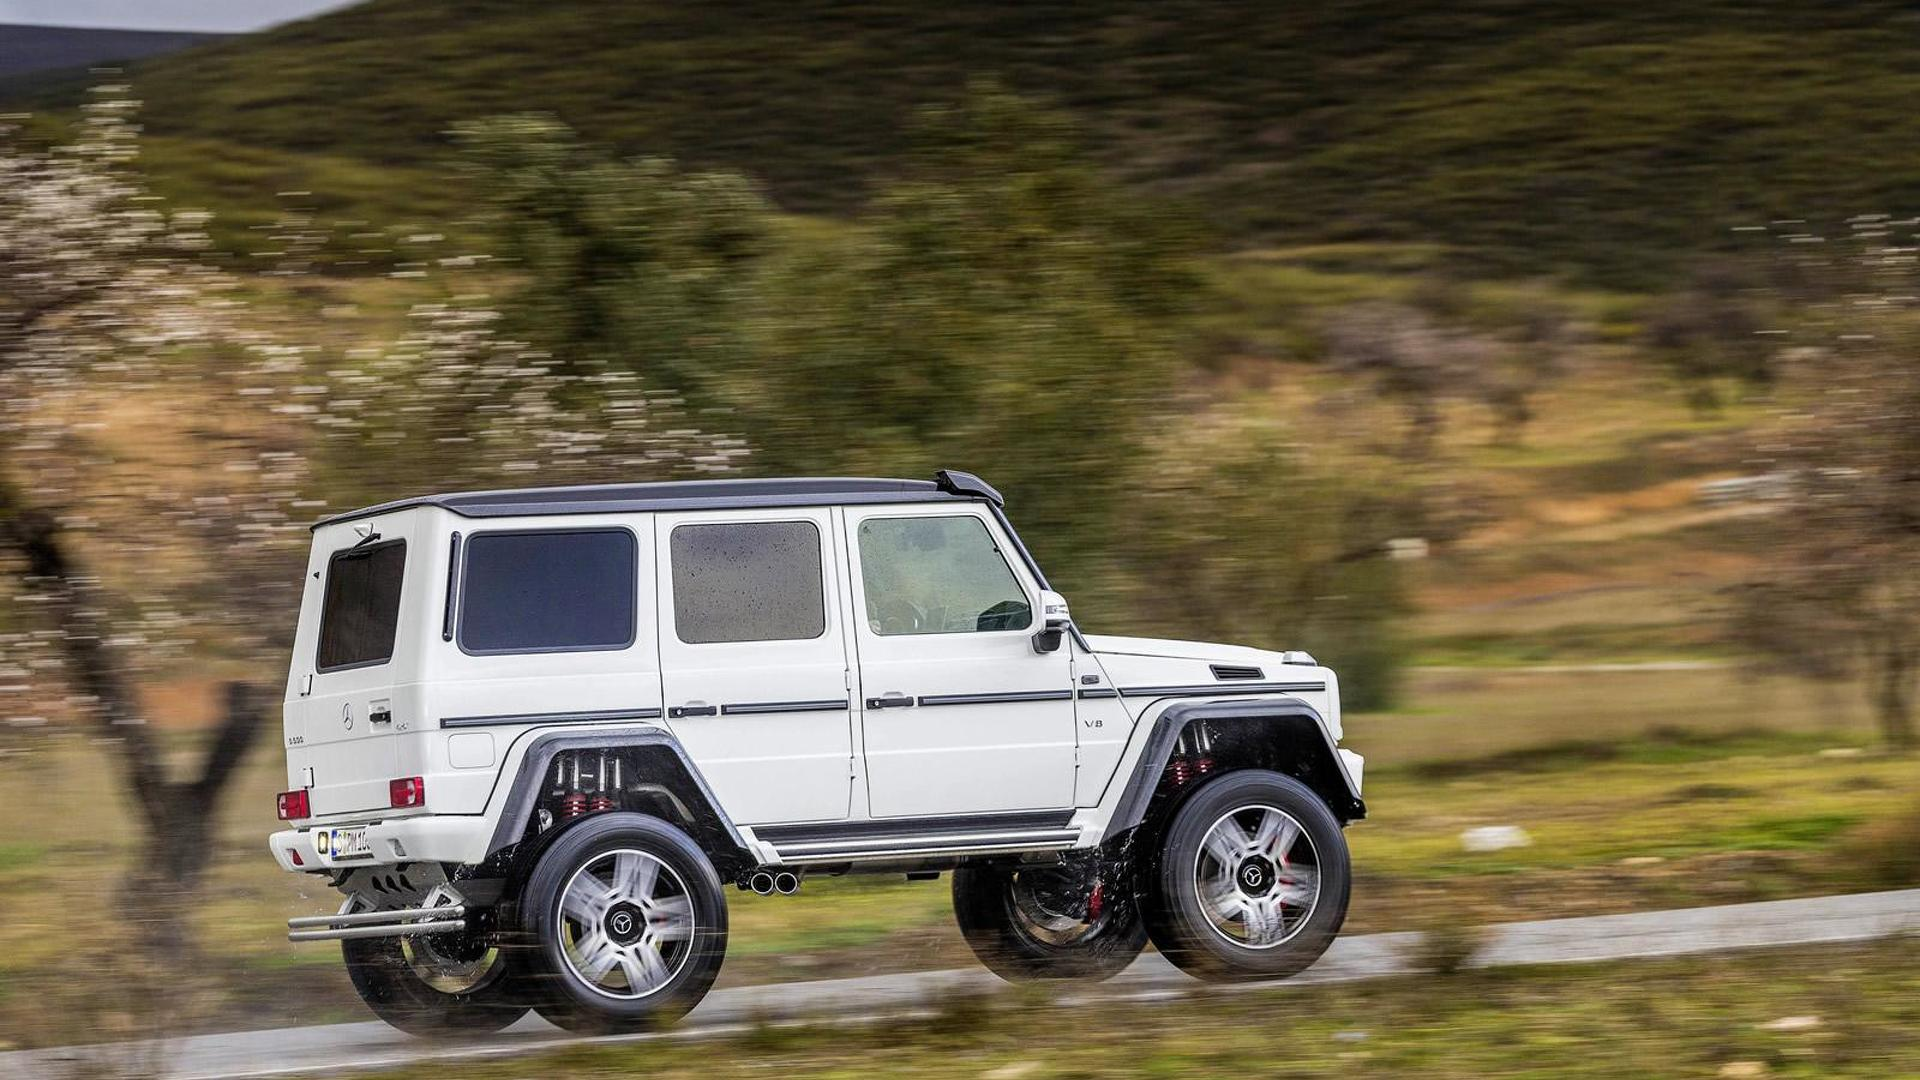 G500 44 是以 G63 AMG 6x6 的架構下改來的強化越野車型,底盤修改幅度相當大,不僅換上四只雙避震器並加高到450mm的離地間距來達到涉水強度達1000mm的成就,另外透過加寬299mm的輪距與 325/55 R22 的越野胎與 22吋強化鋁圈設定,最後再換上不輸給 Mercedes-AMG 63 系列的 4.0 V8 雙渦輪增壓引擎,最大馬力422hp、最大扭力 450 lb-ft 搭配三差速七速自動變速箱,讓 G500 44 已經可以攻克全球7成以上的艱難地形,說是半兩棲越野車都不為過